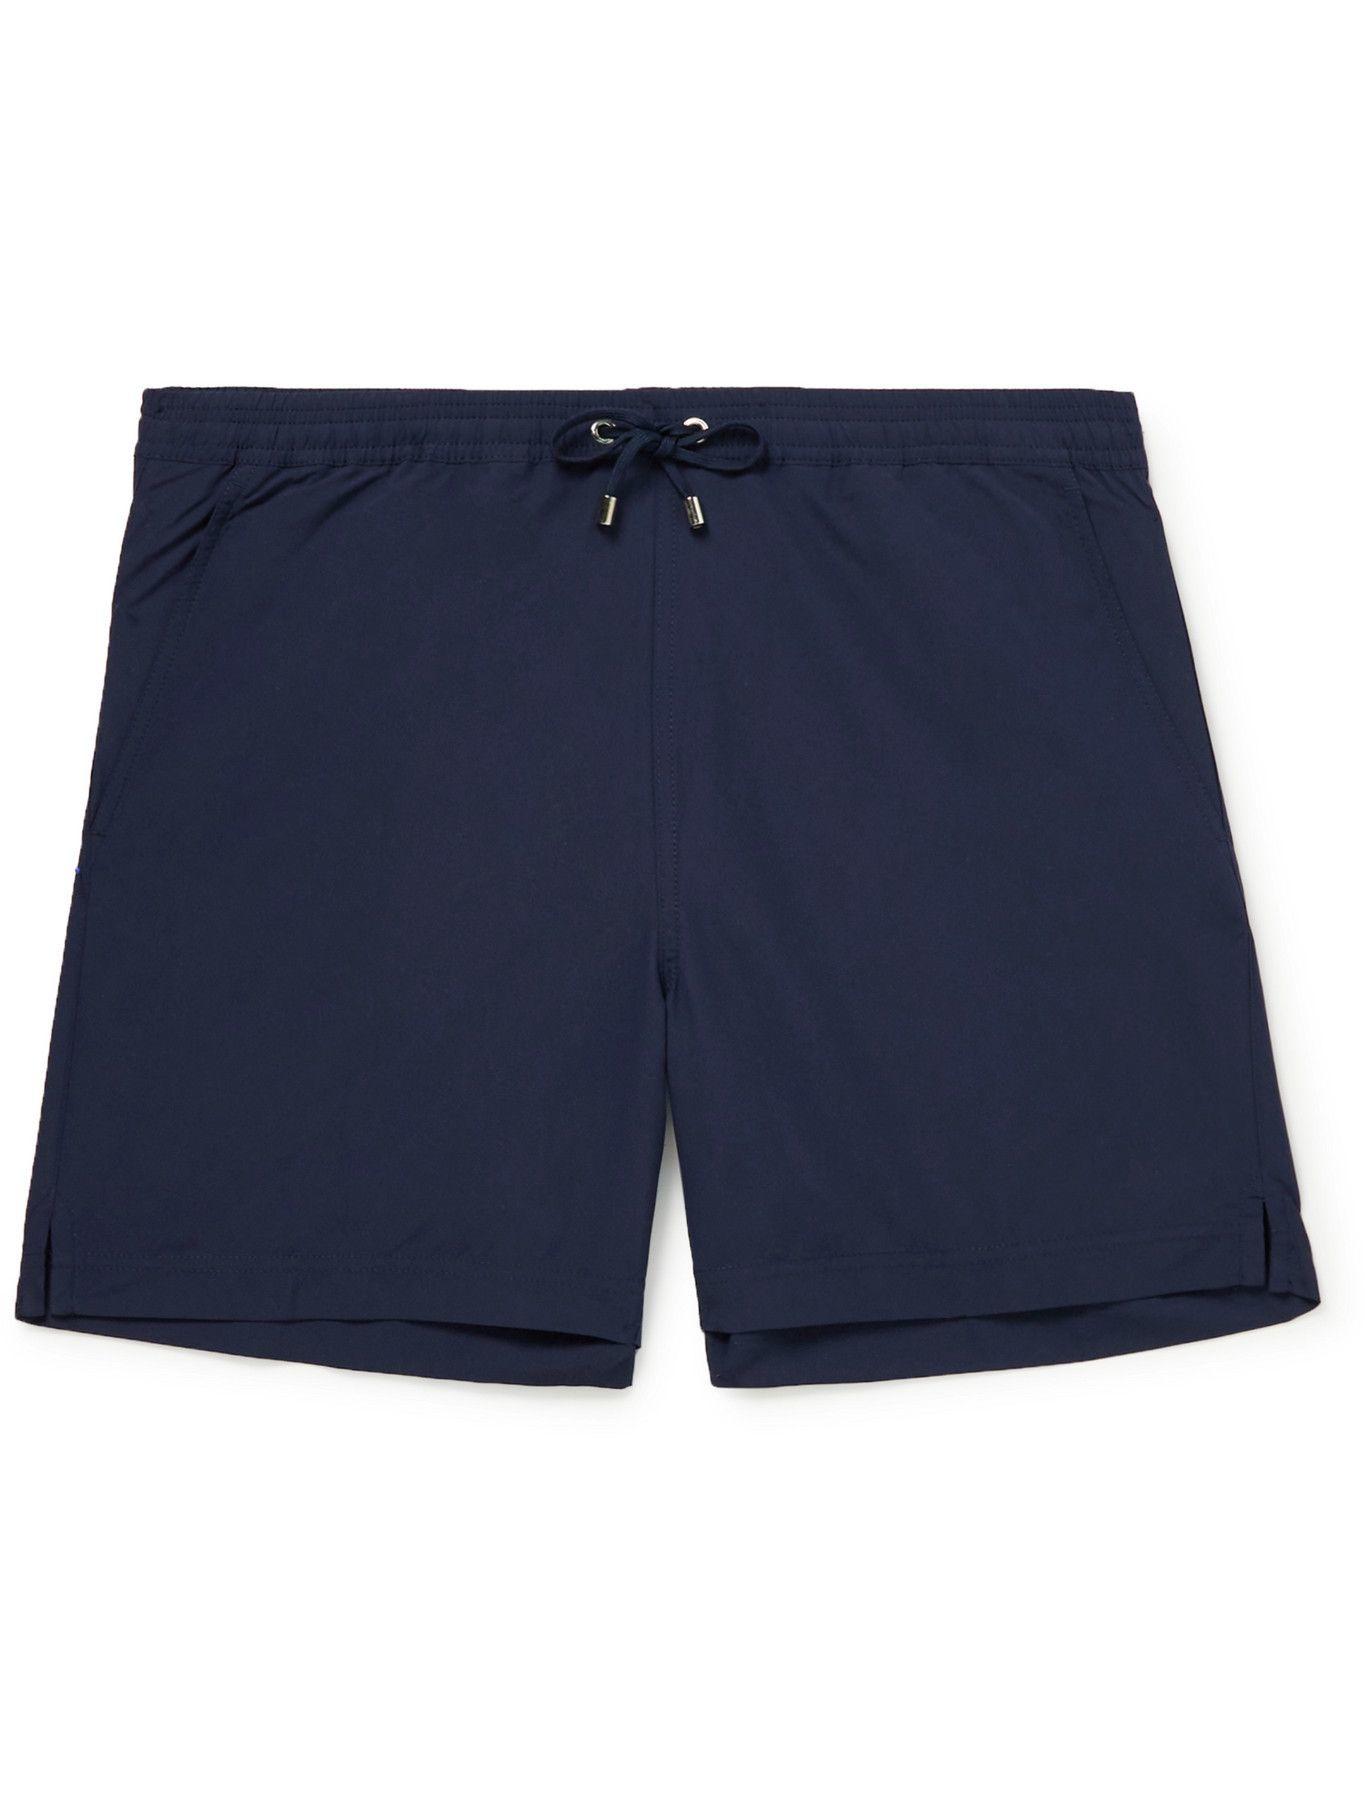 SUNSPEL - Mid-Length Recycled SEAQUAL Swim Shorts - Blue